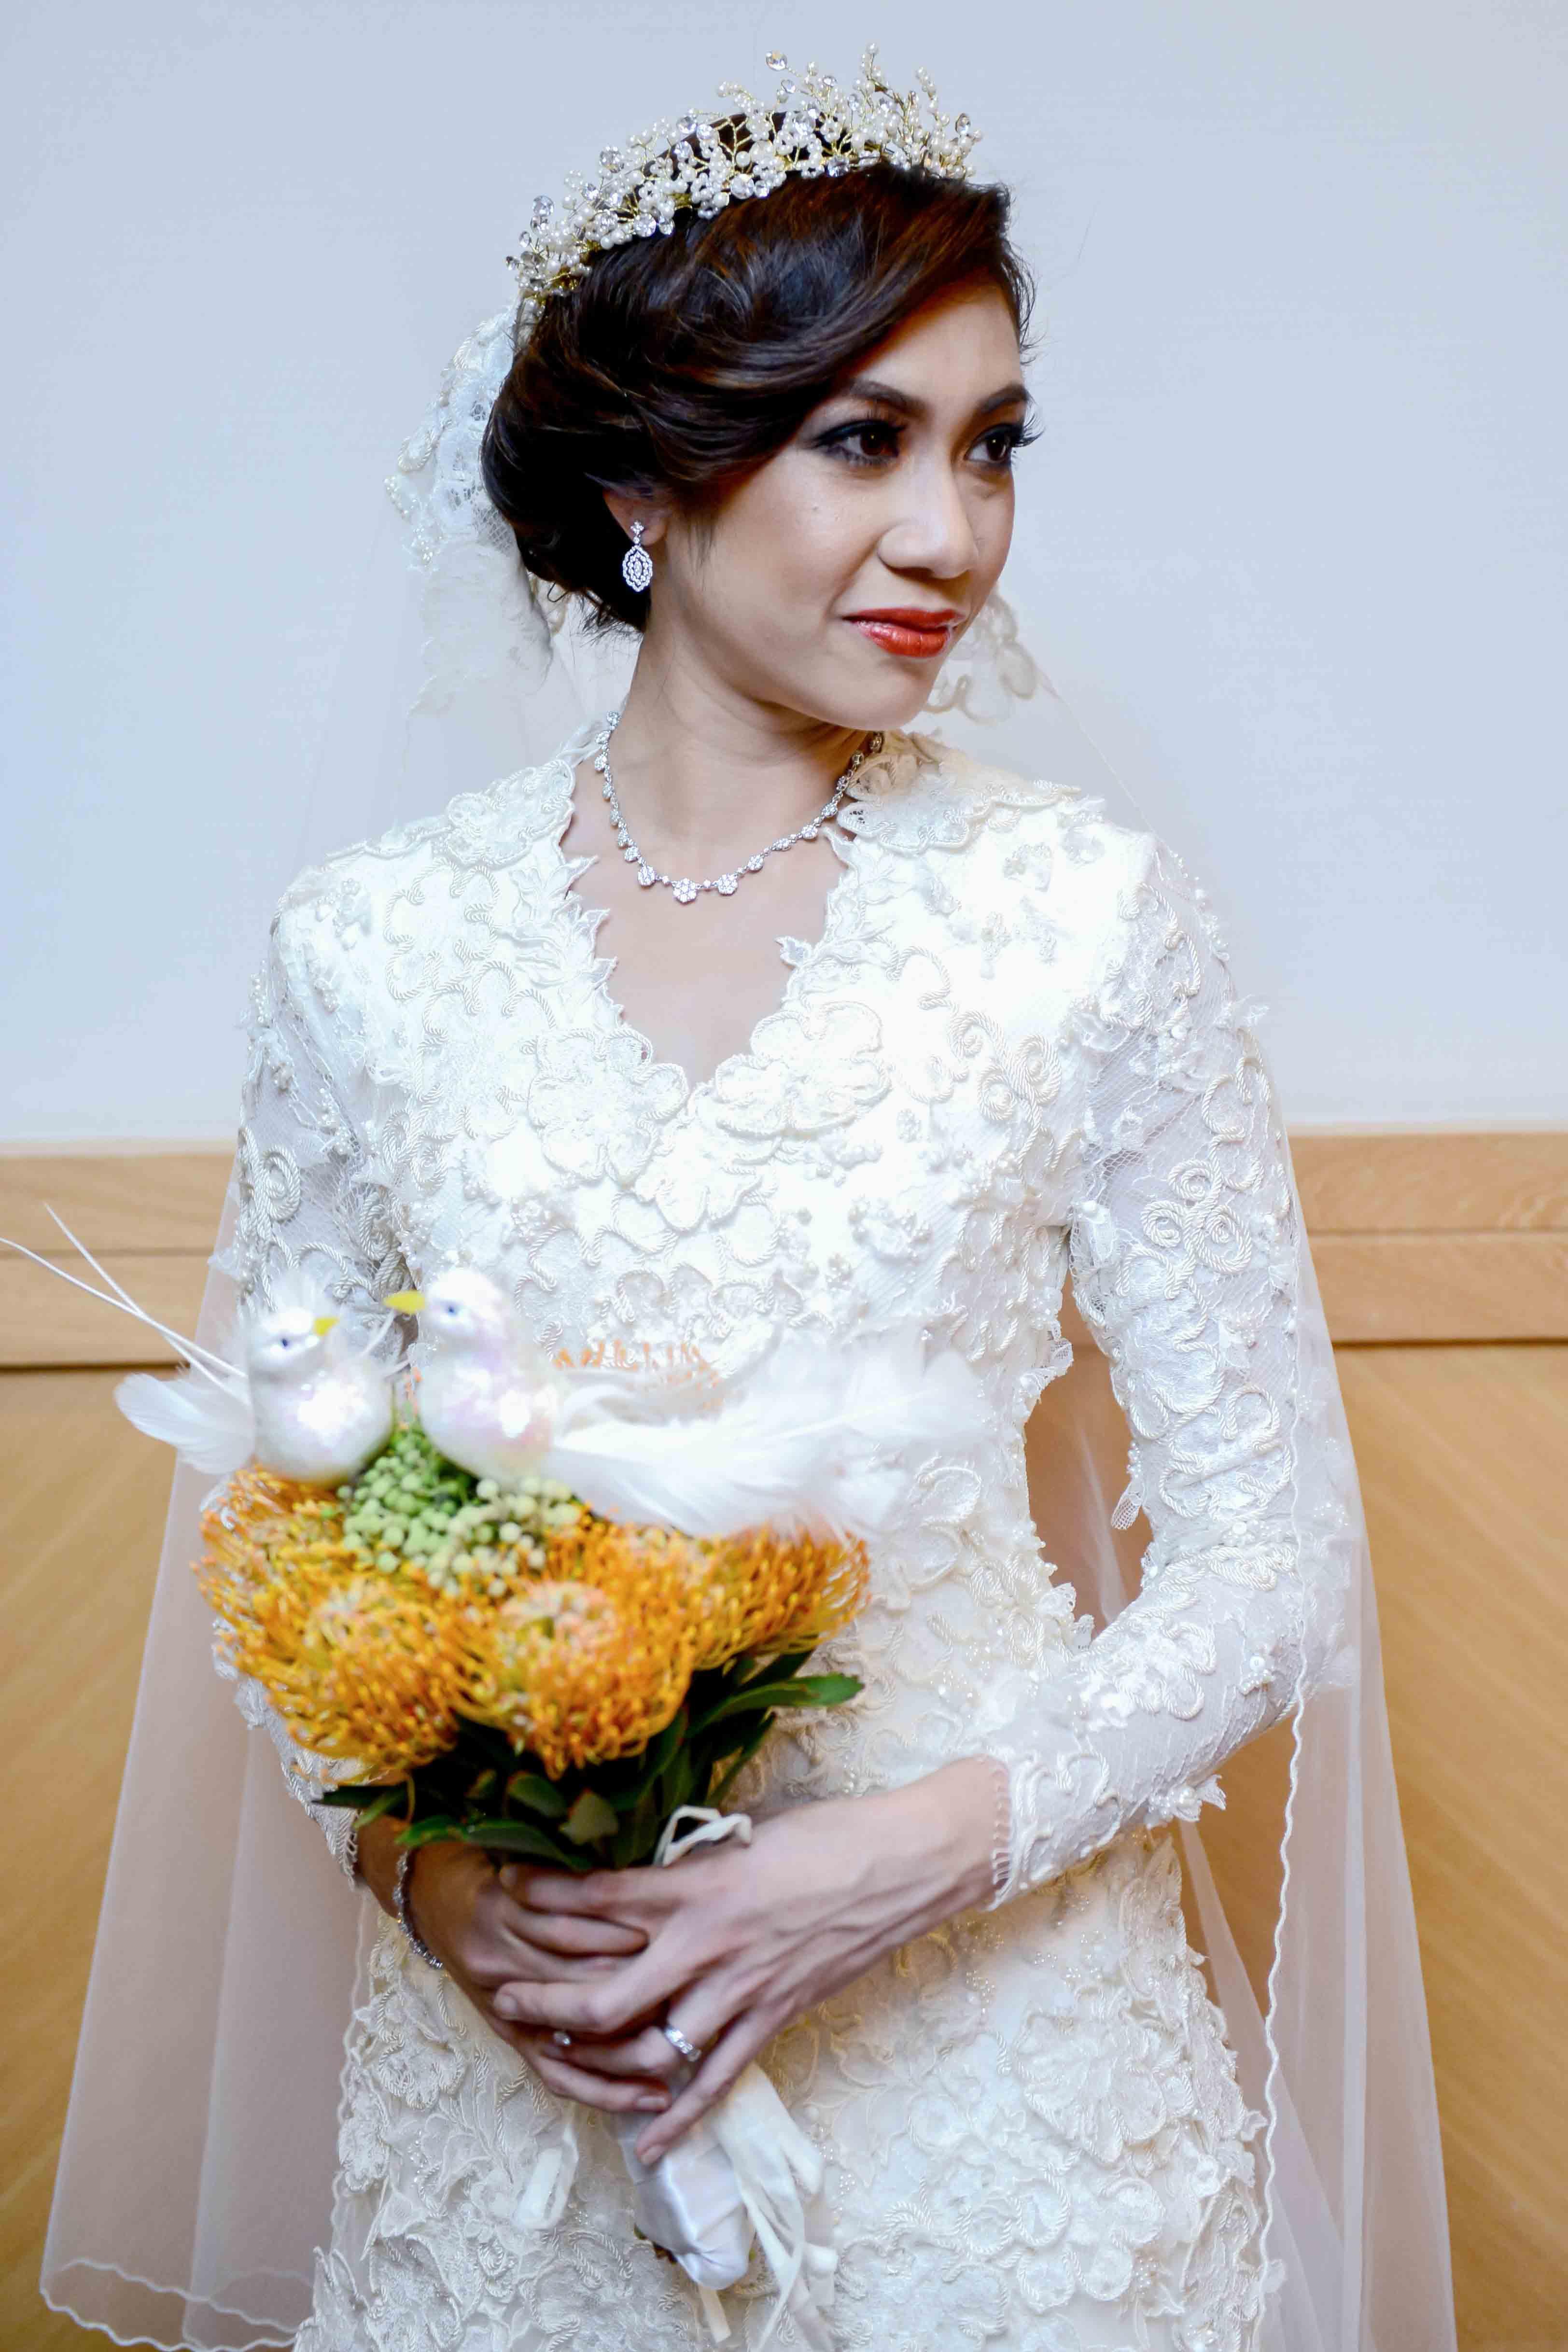 Wedding Reception - Faiq & Ili by Raihan Talib Photography ...